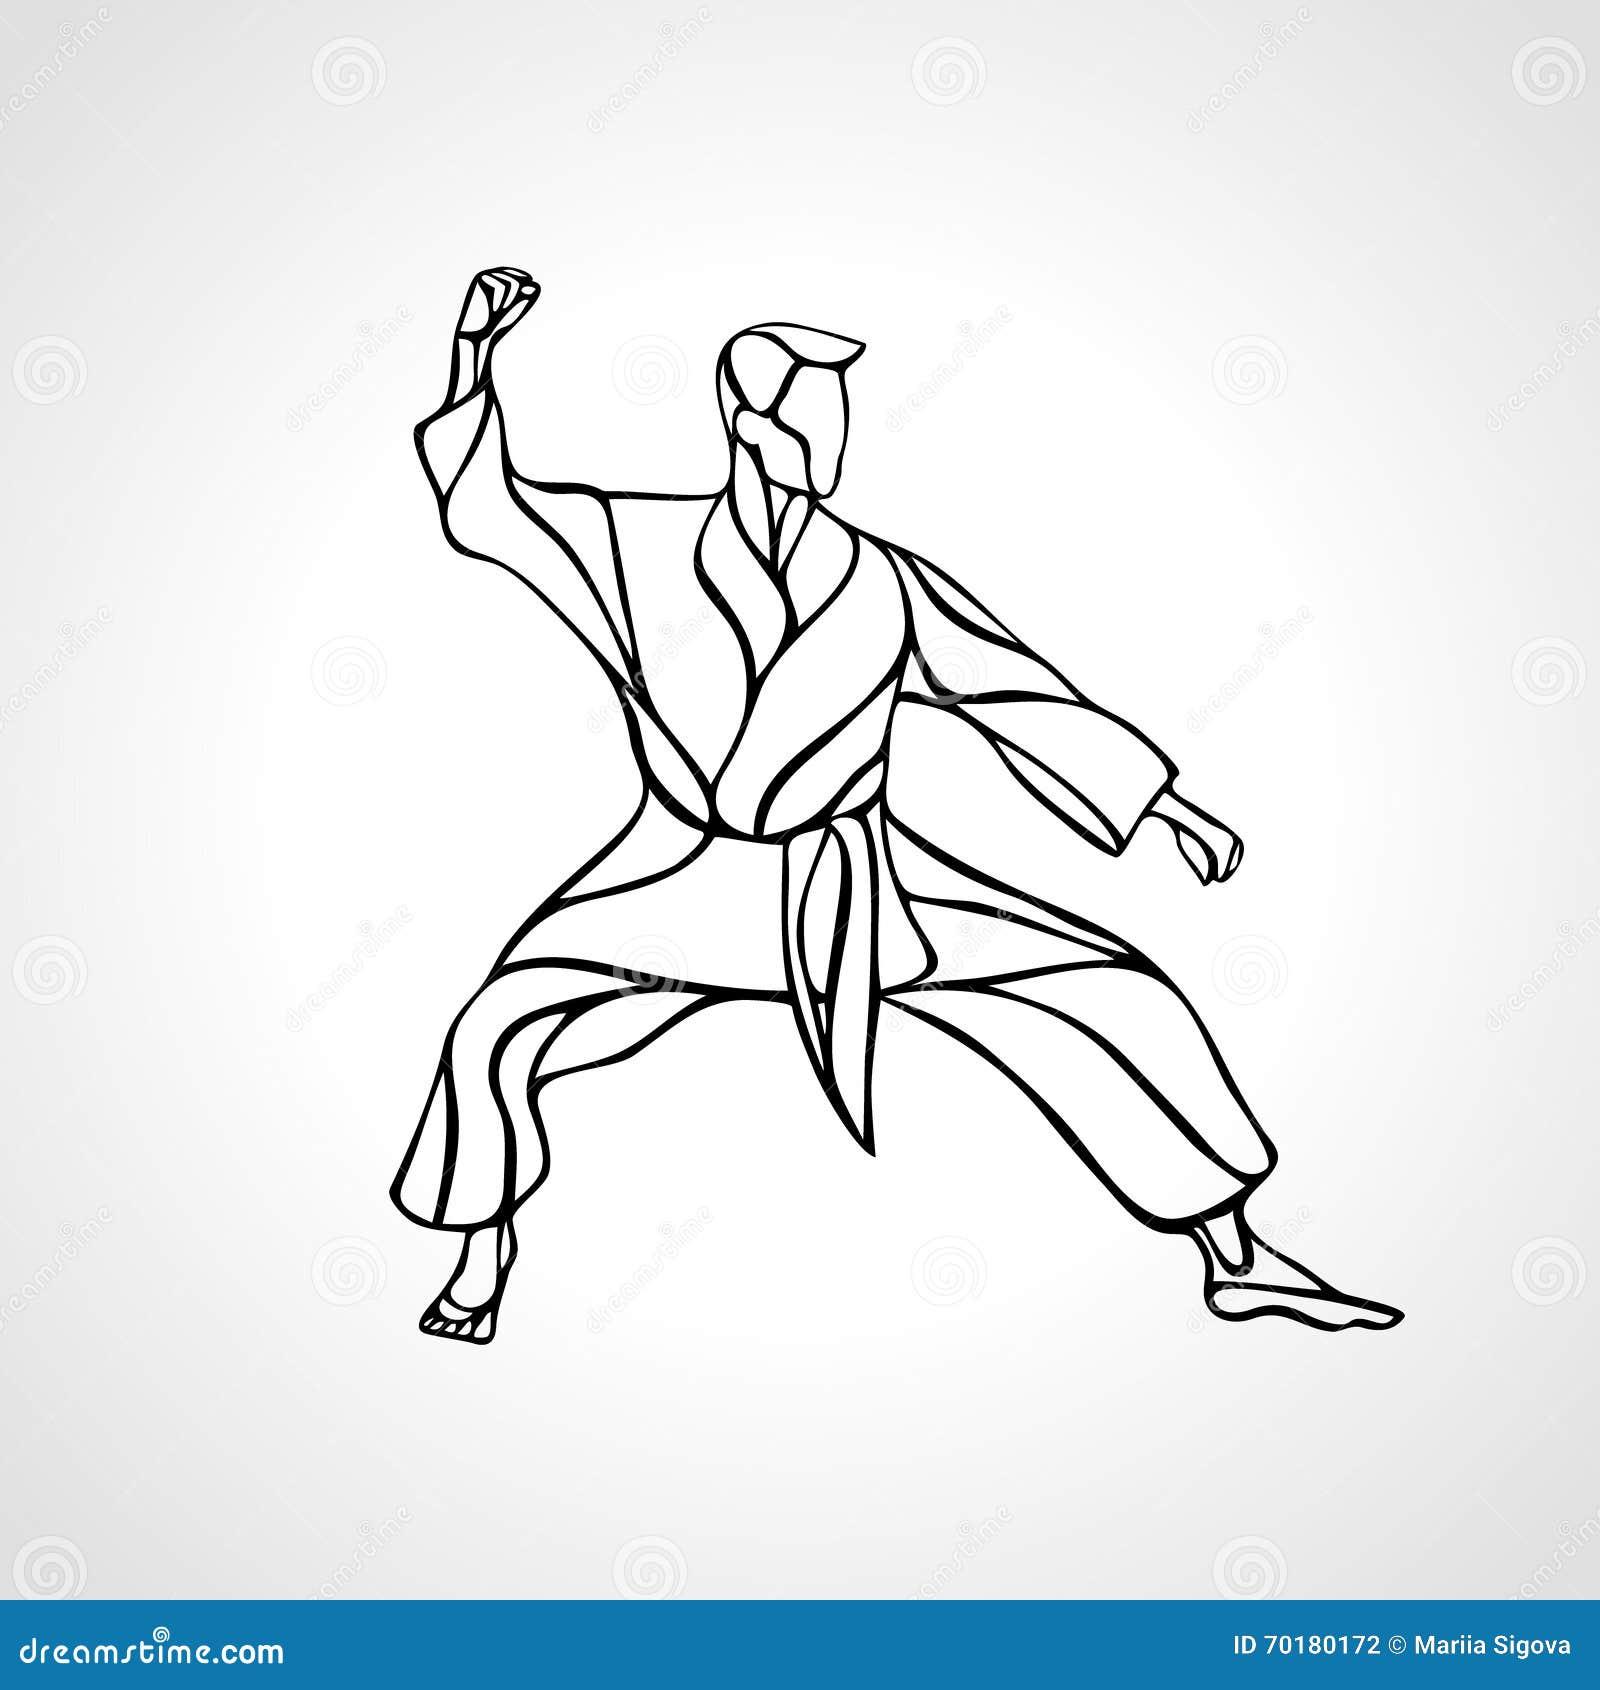 Kampsporter poserar konturn Karatekämpe